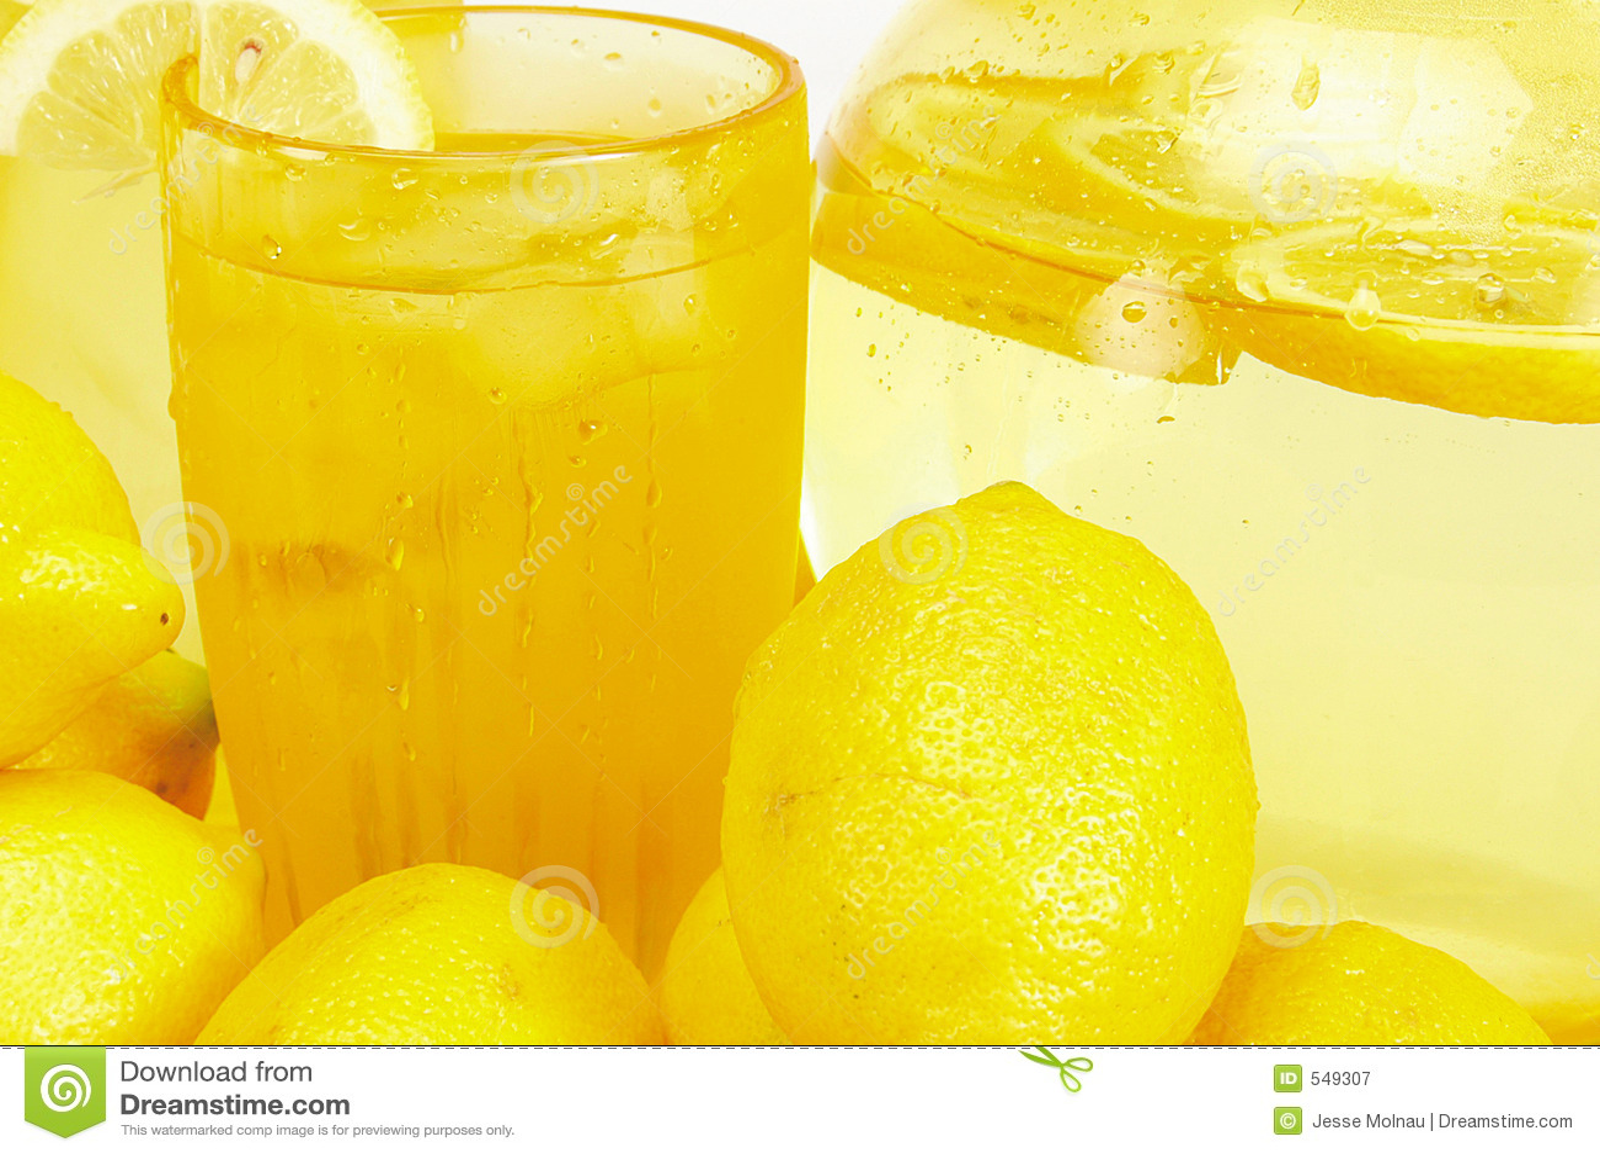 Lemons and Lemonade stock image. Image of yellow, food ...